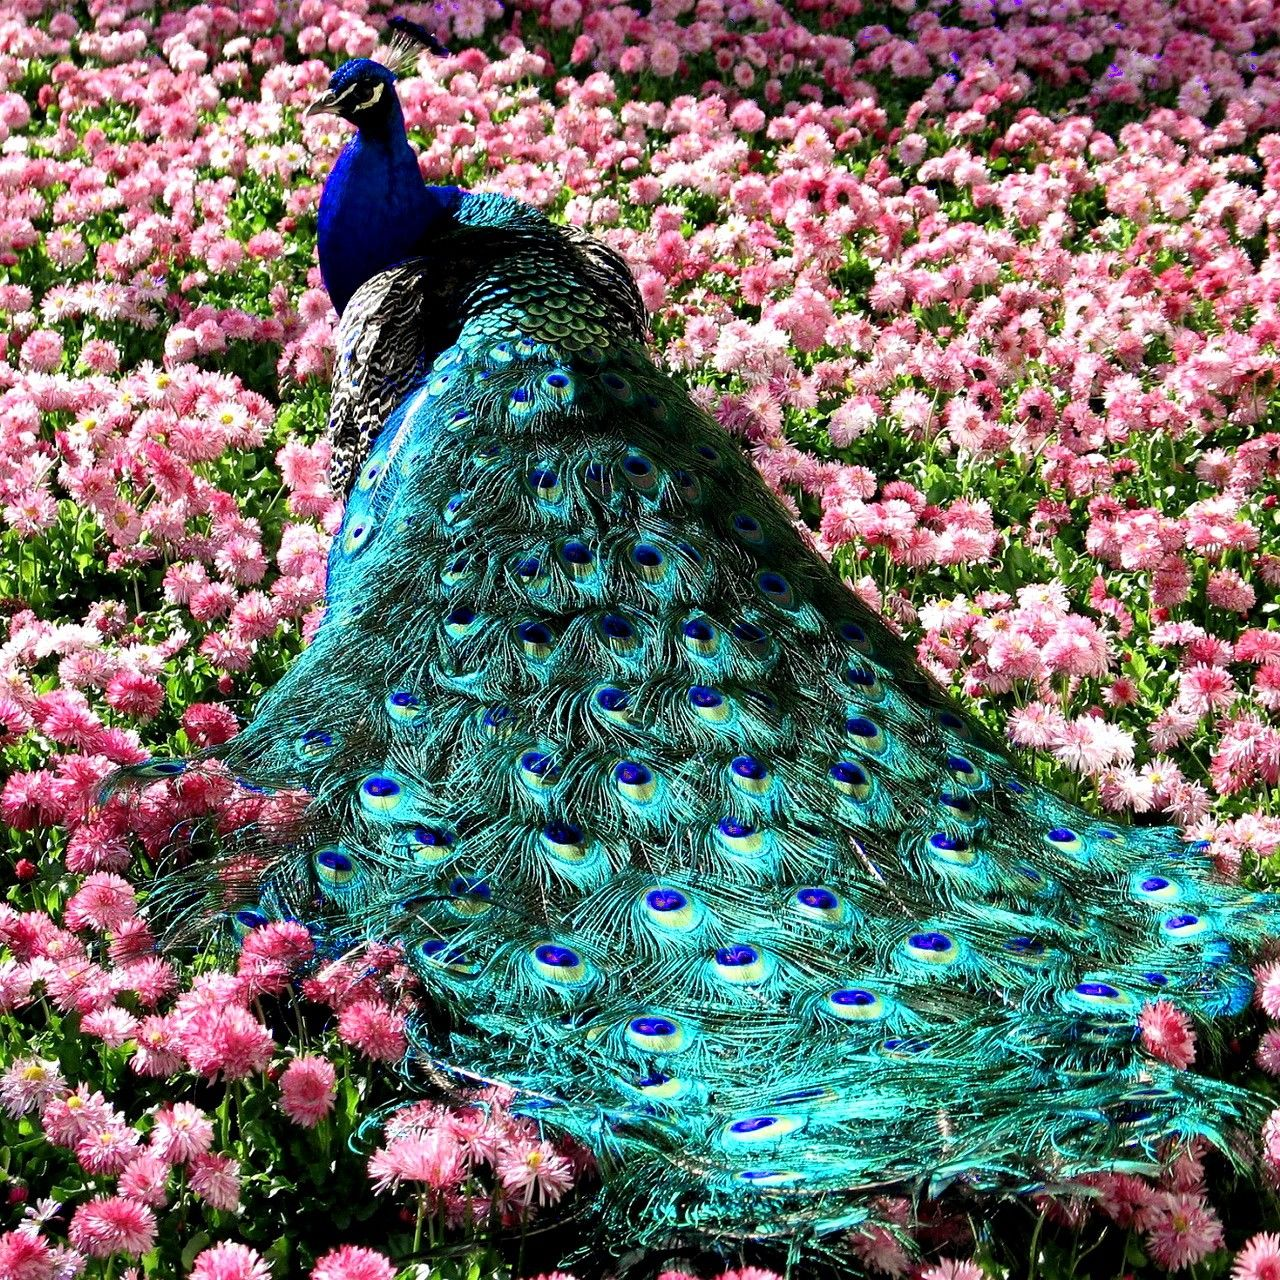 beautiful, this incredible peacock inspires me beyond words.